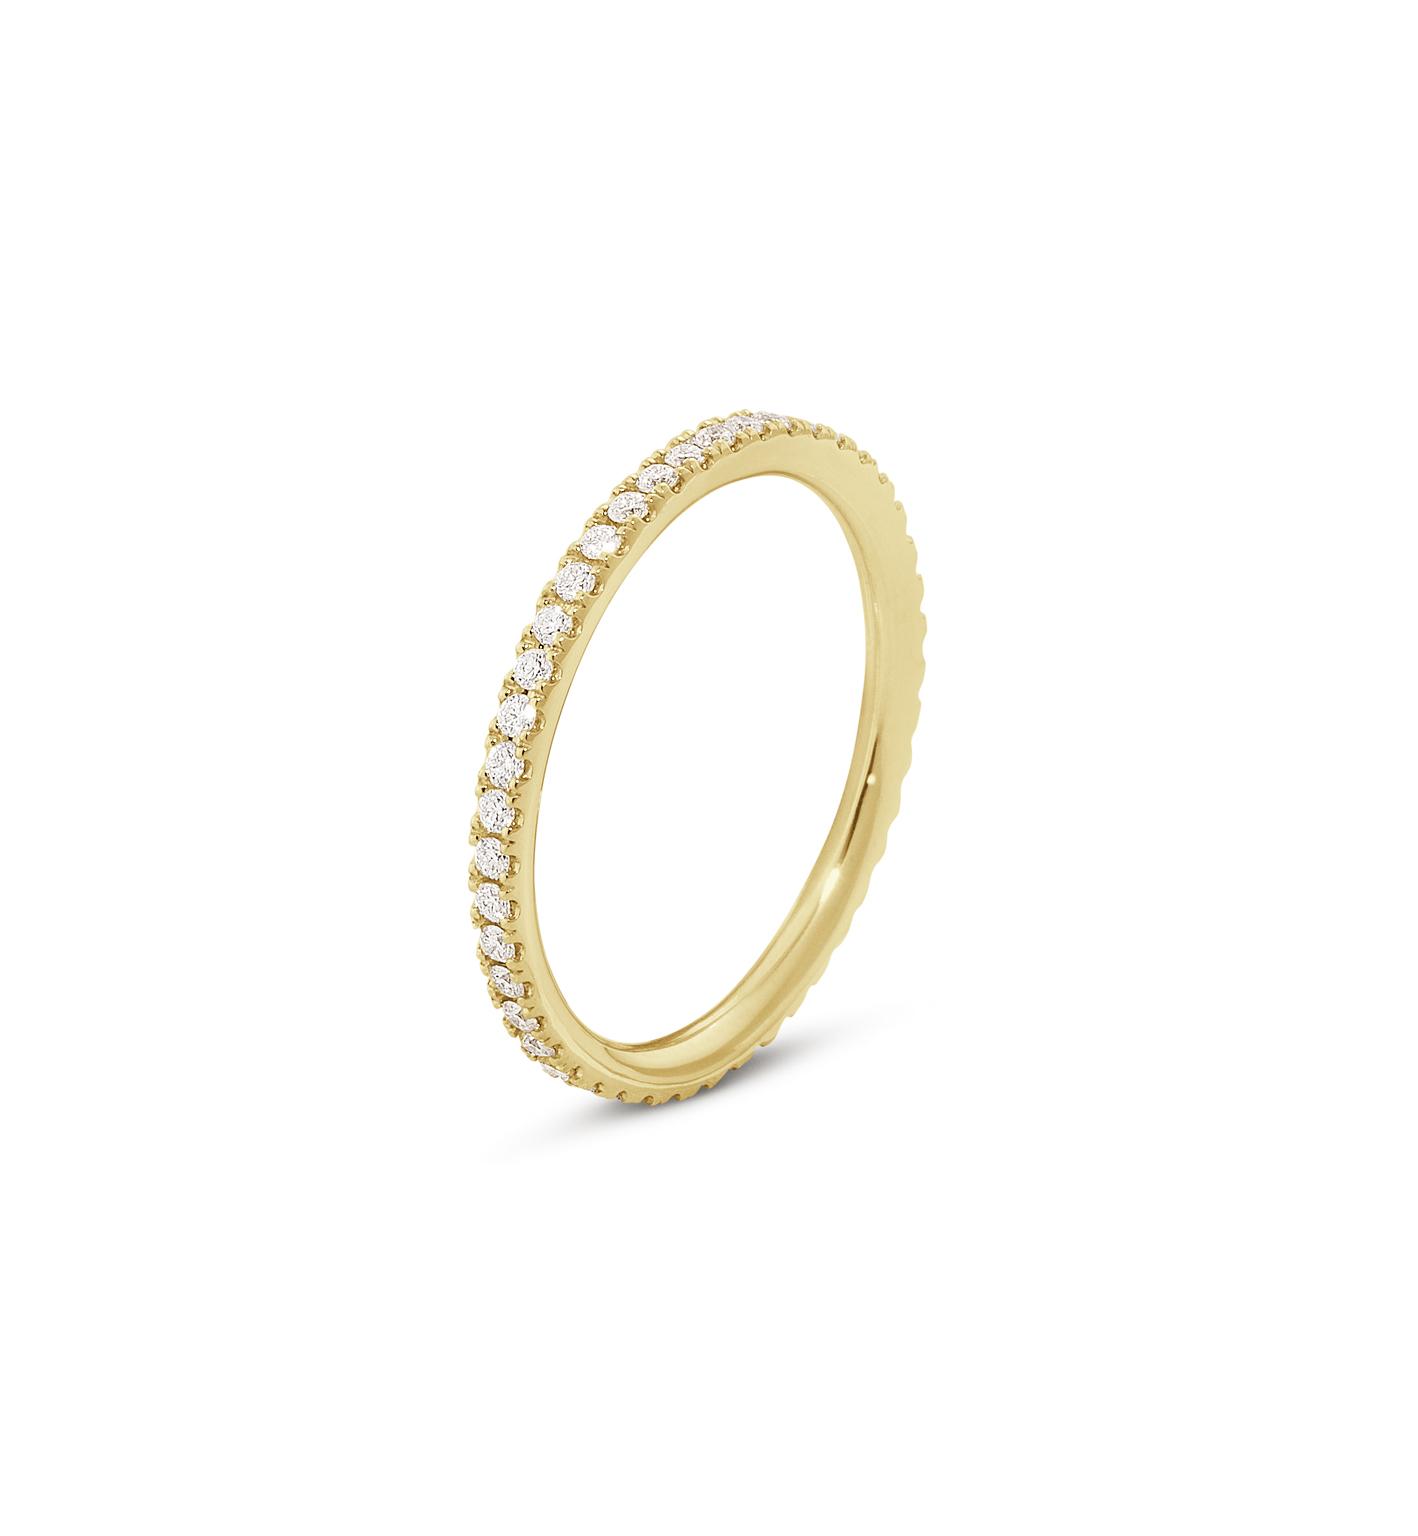 Georg Jensen AURORA ring - 3572720 18 kt rdg / ialt 0,25 ct 58